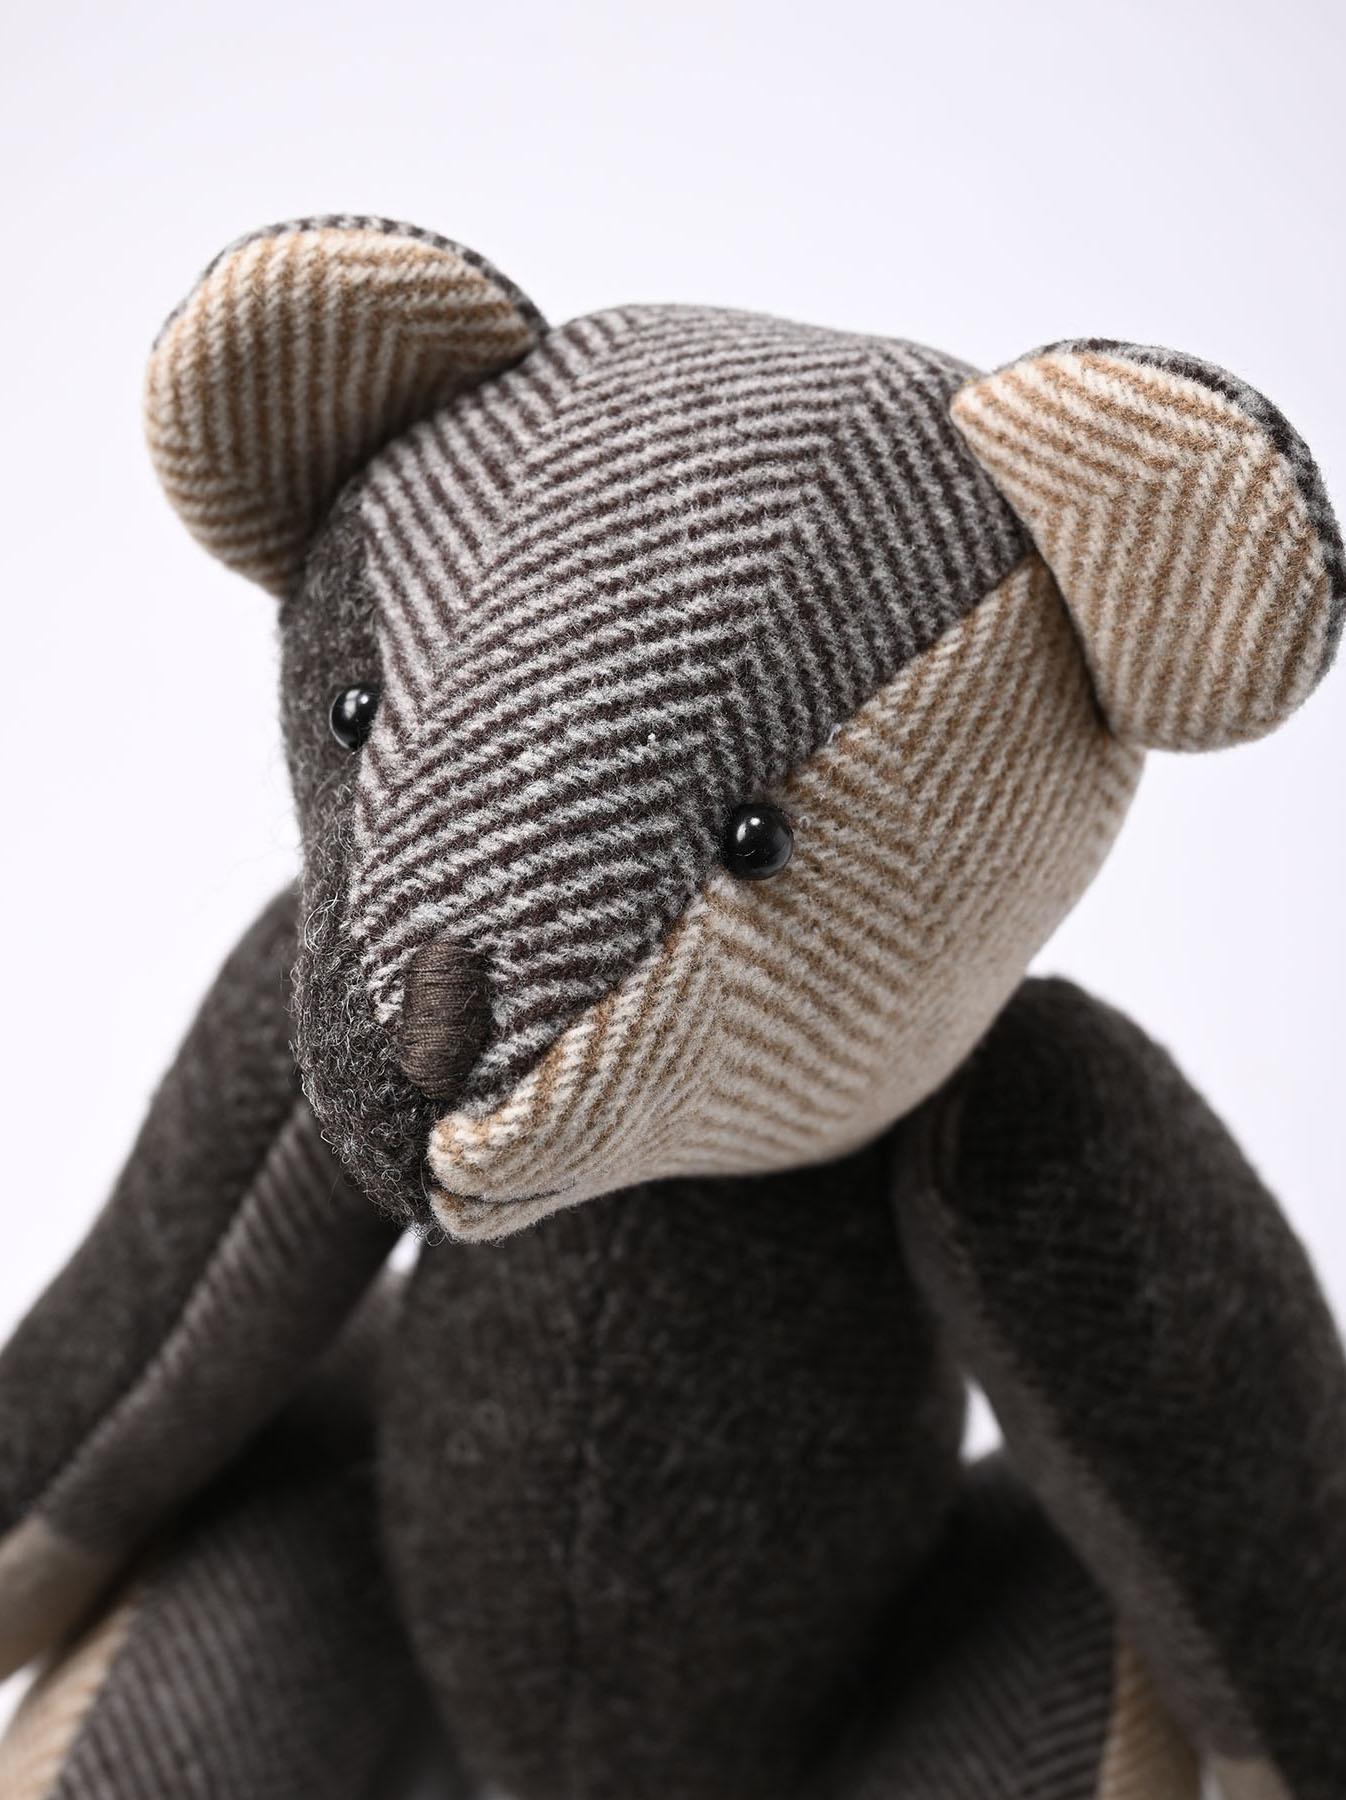 Stuffed Toy Bear-7